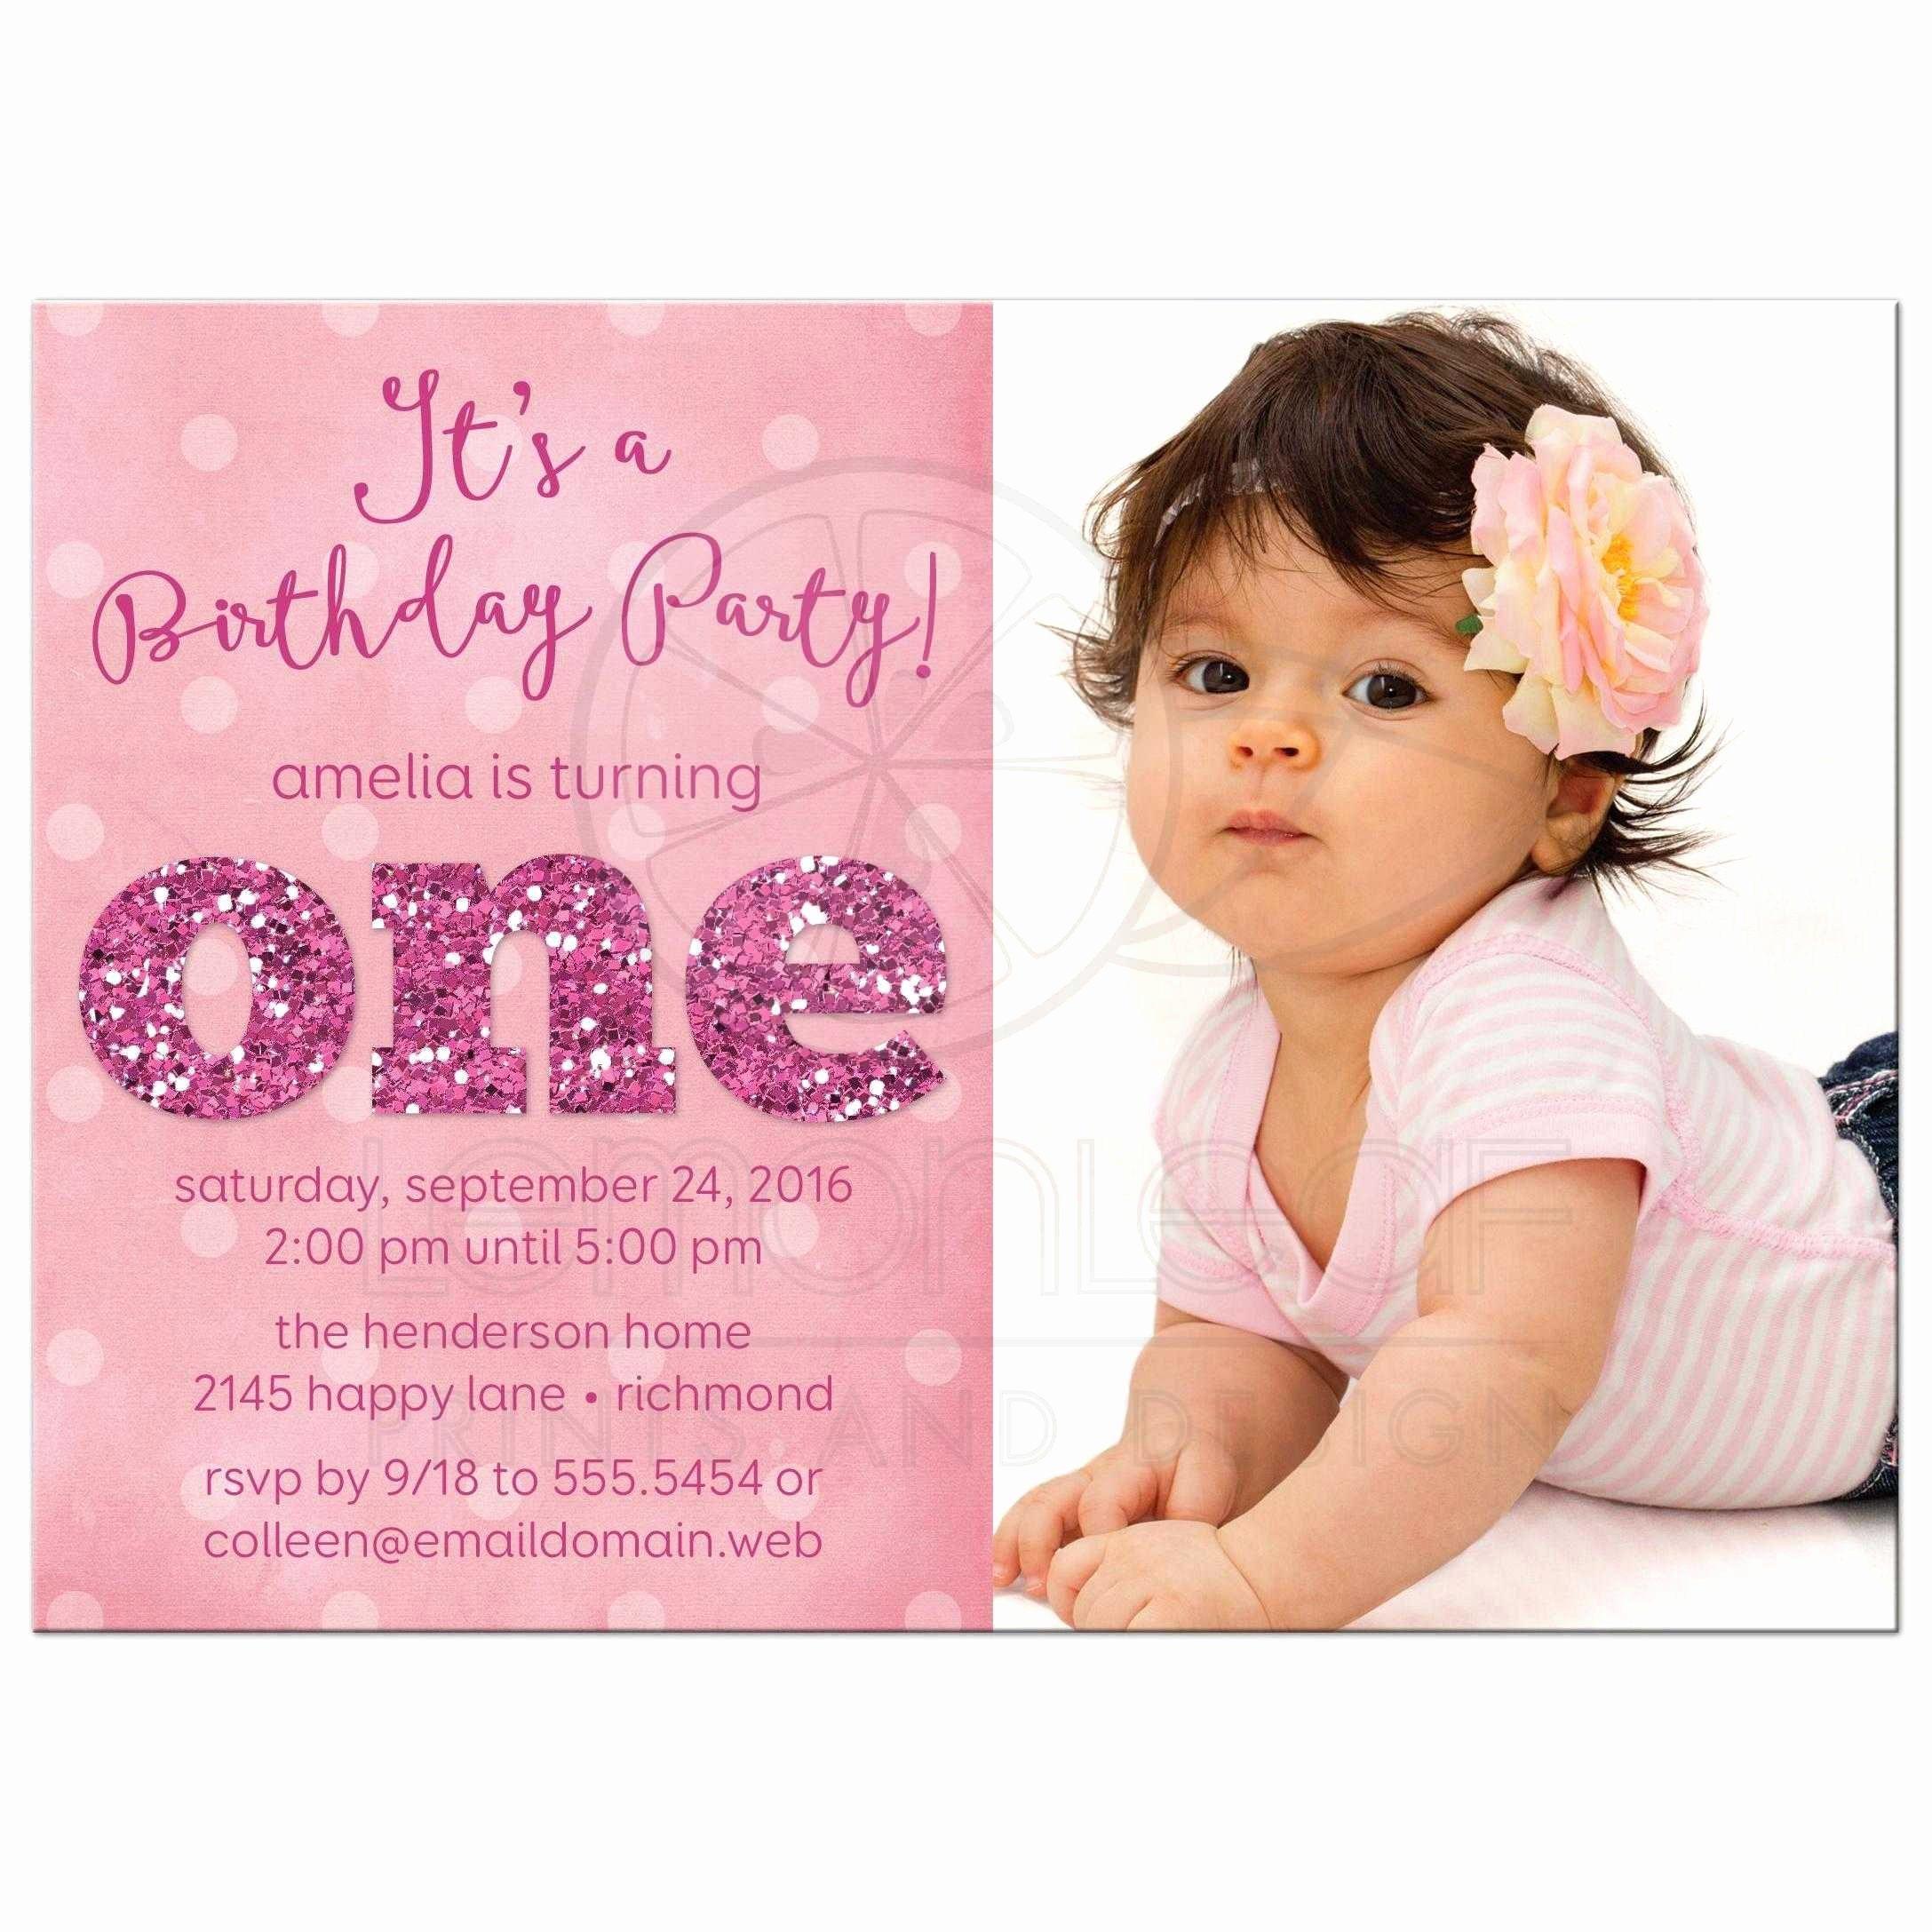 1st Birthday Invitation Wording Samples Luxury 1st Birthday An In 2020 Birthday Invitation Card Template 1st Birthday Party Invitations 1st Birthday Invitation Wording